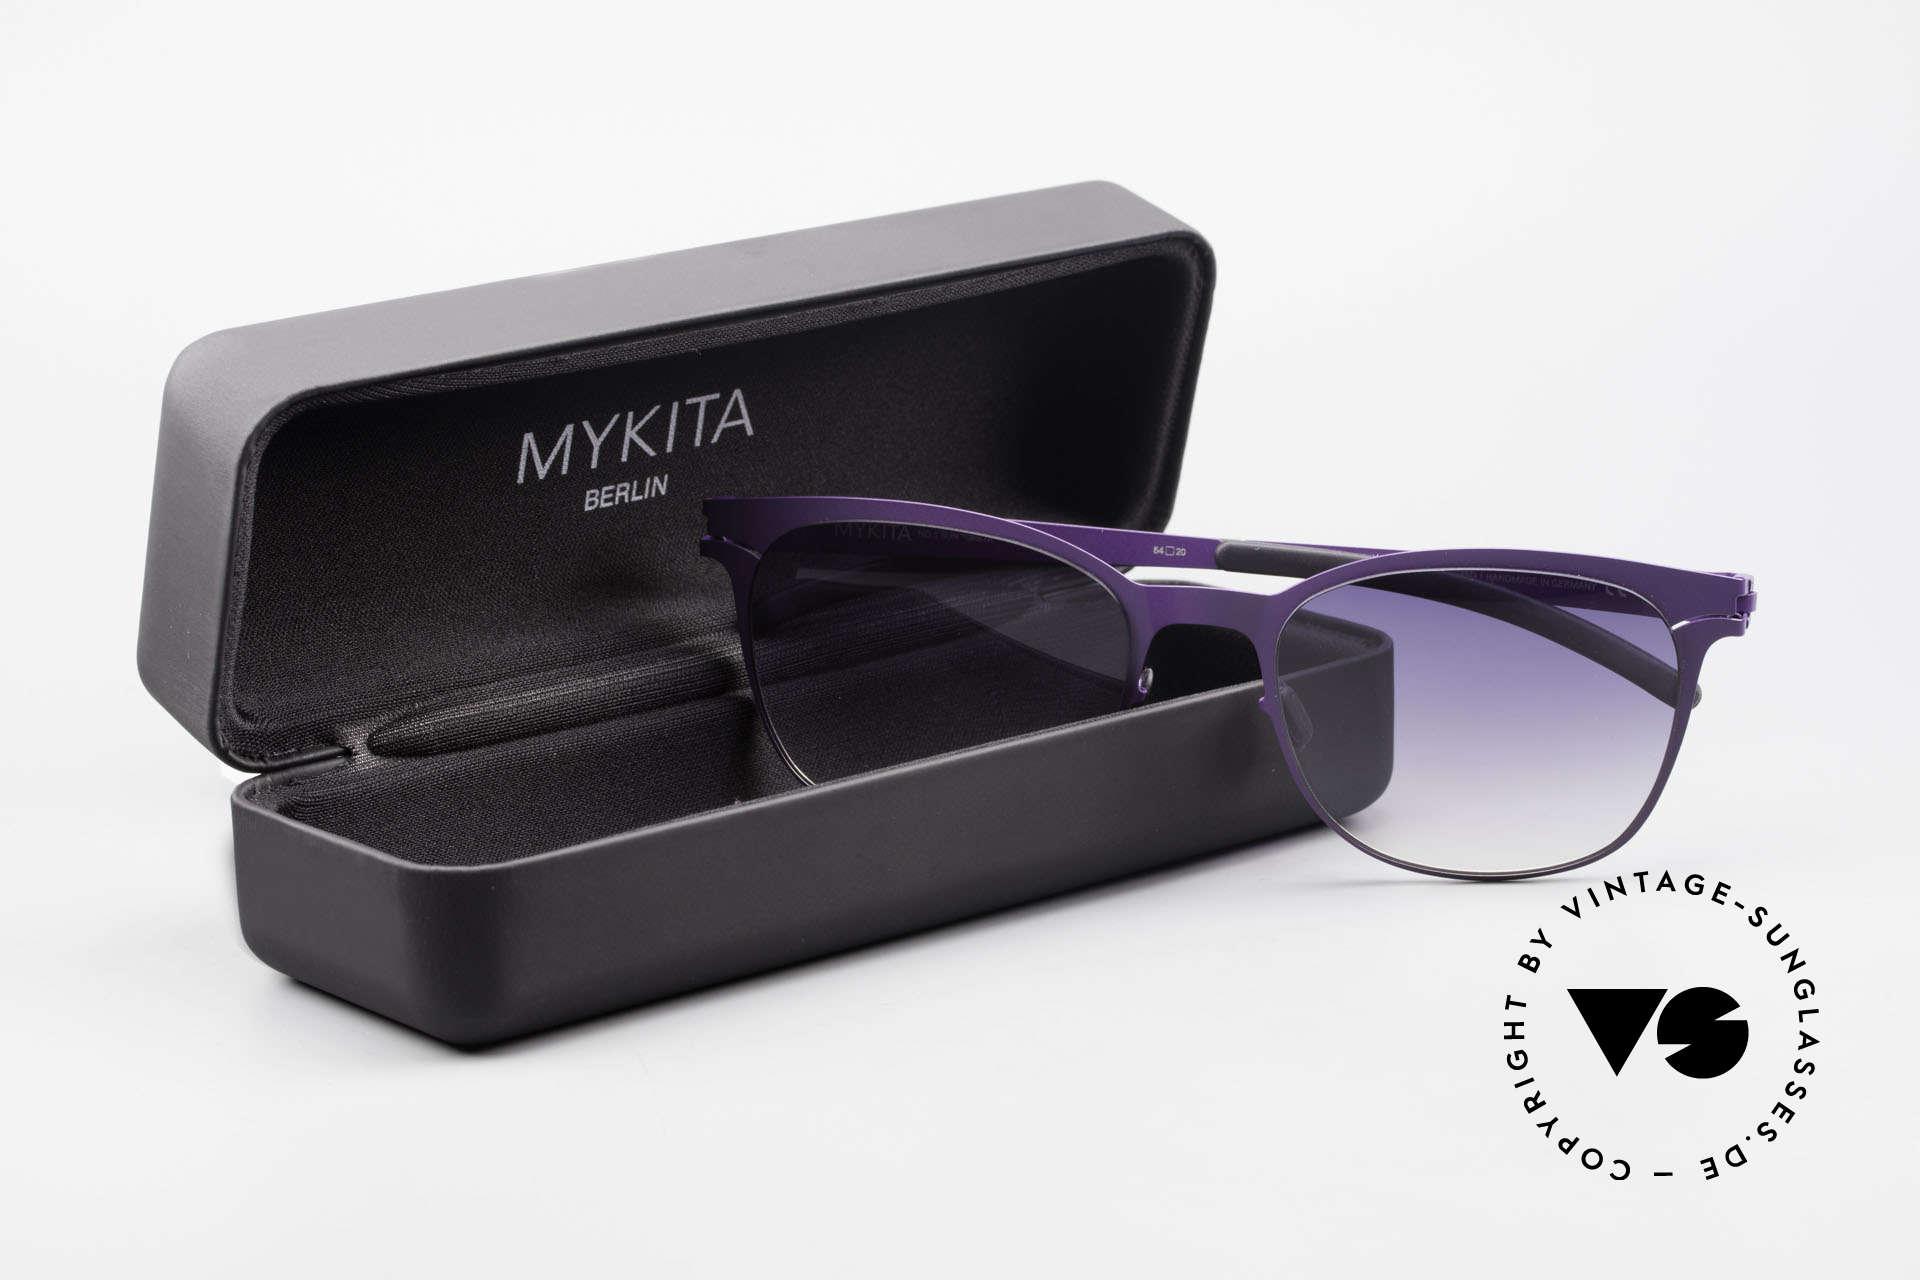 Mykita Greta Ladies Designer Sunglasses, Size: medium, Made for Women